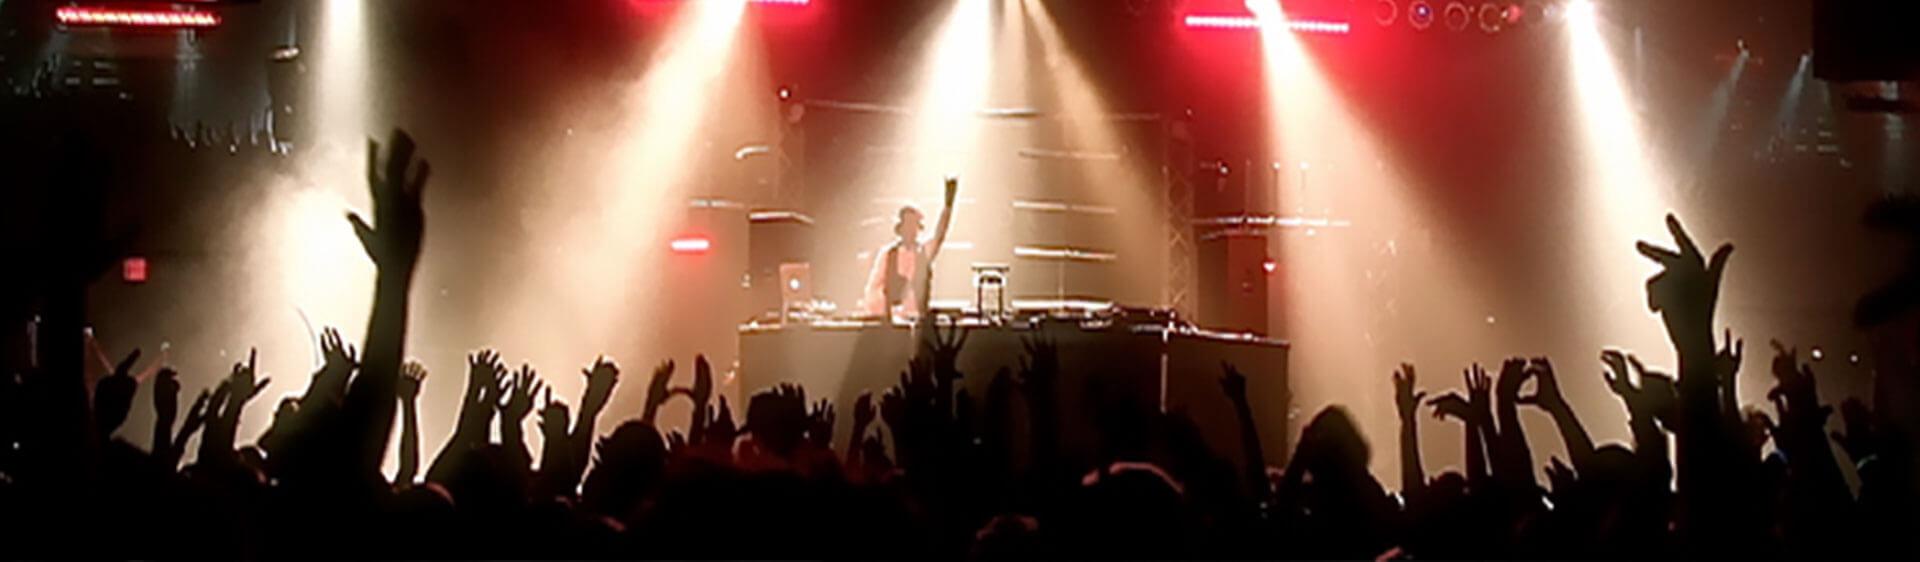 Toronto-School-Dance-DJ